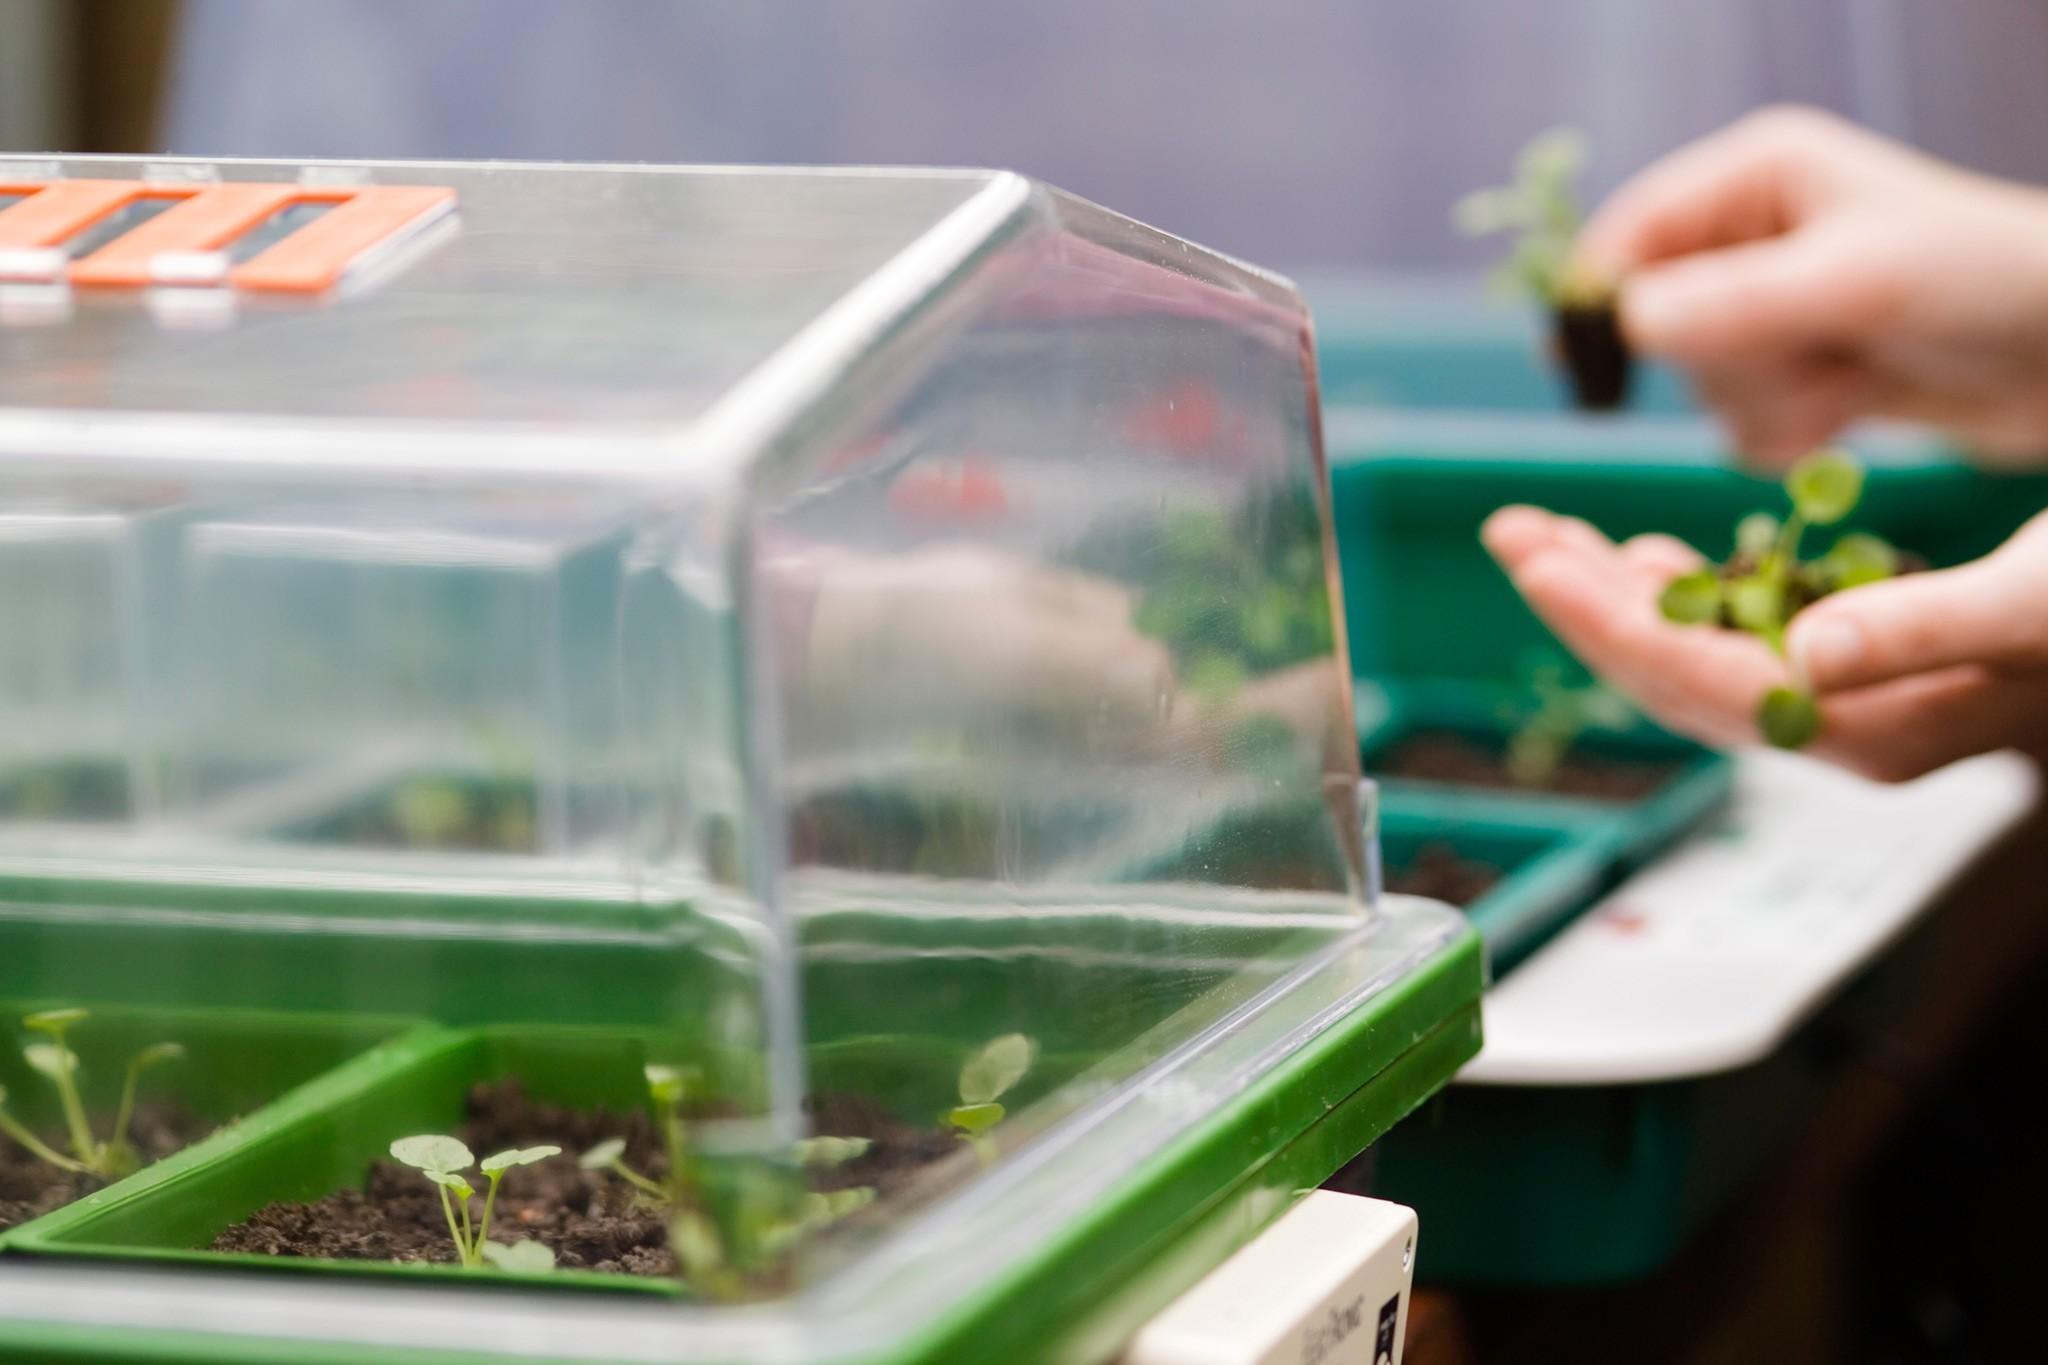 Propagator in a greenhouse